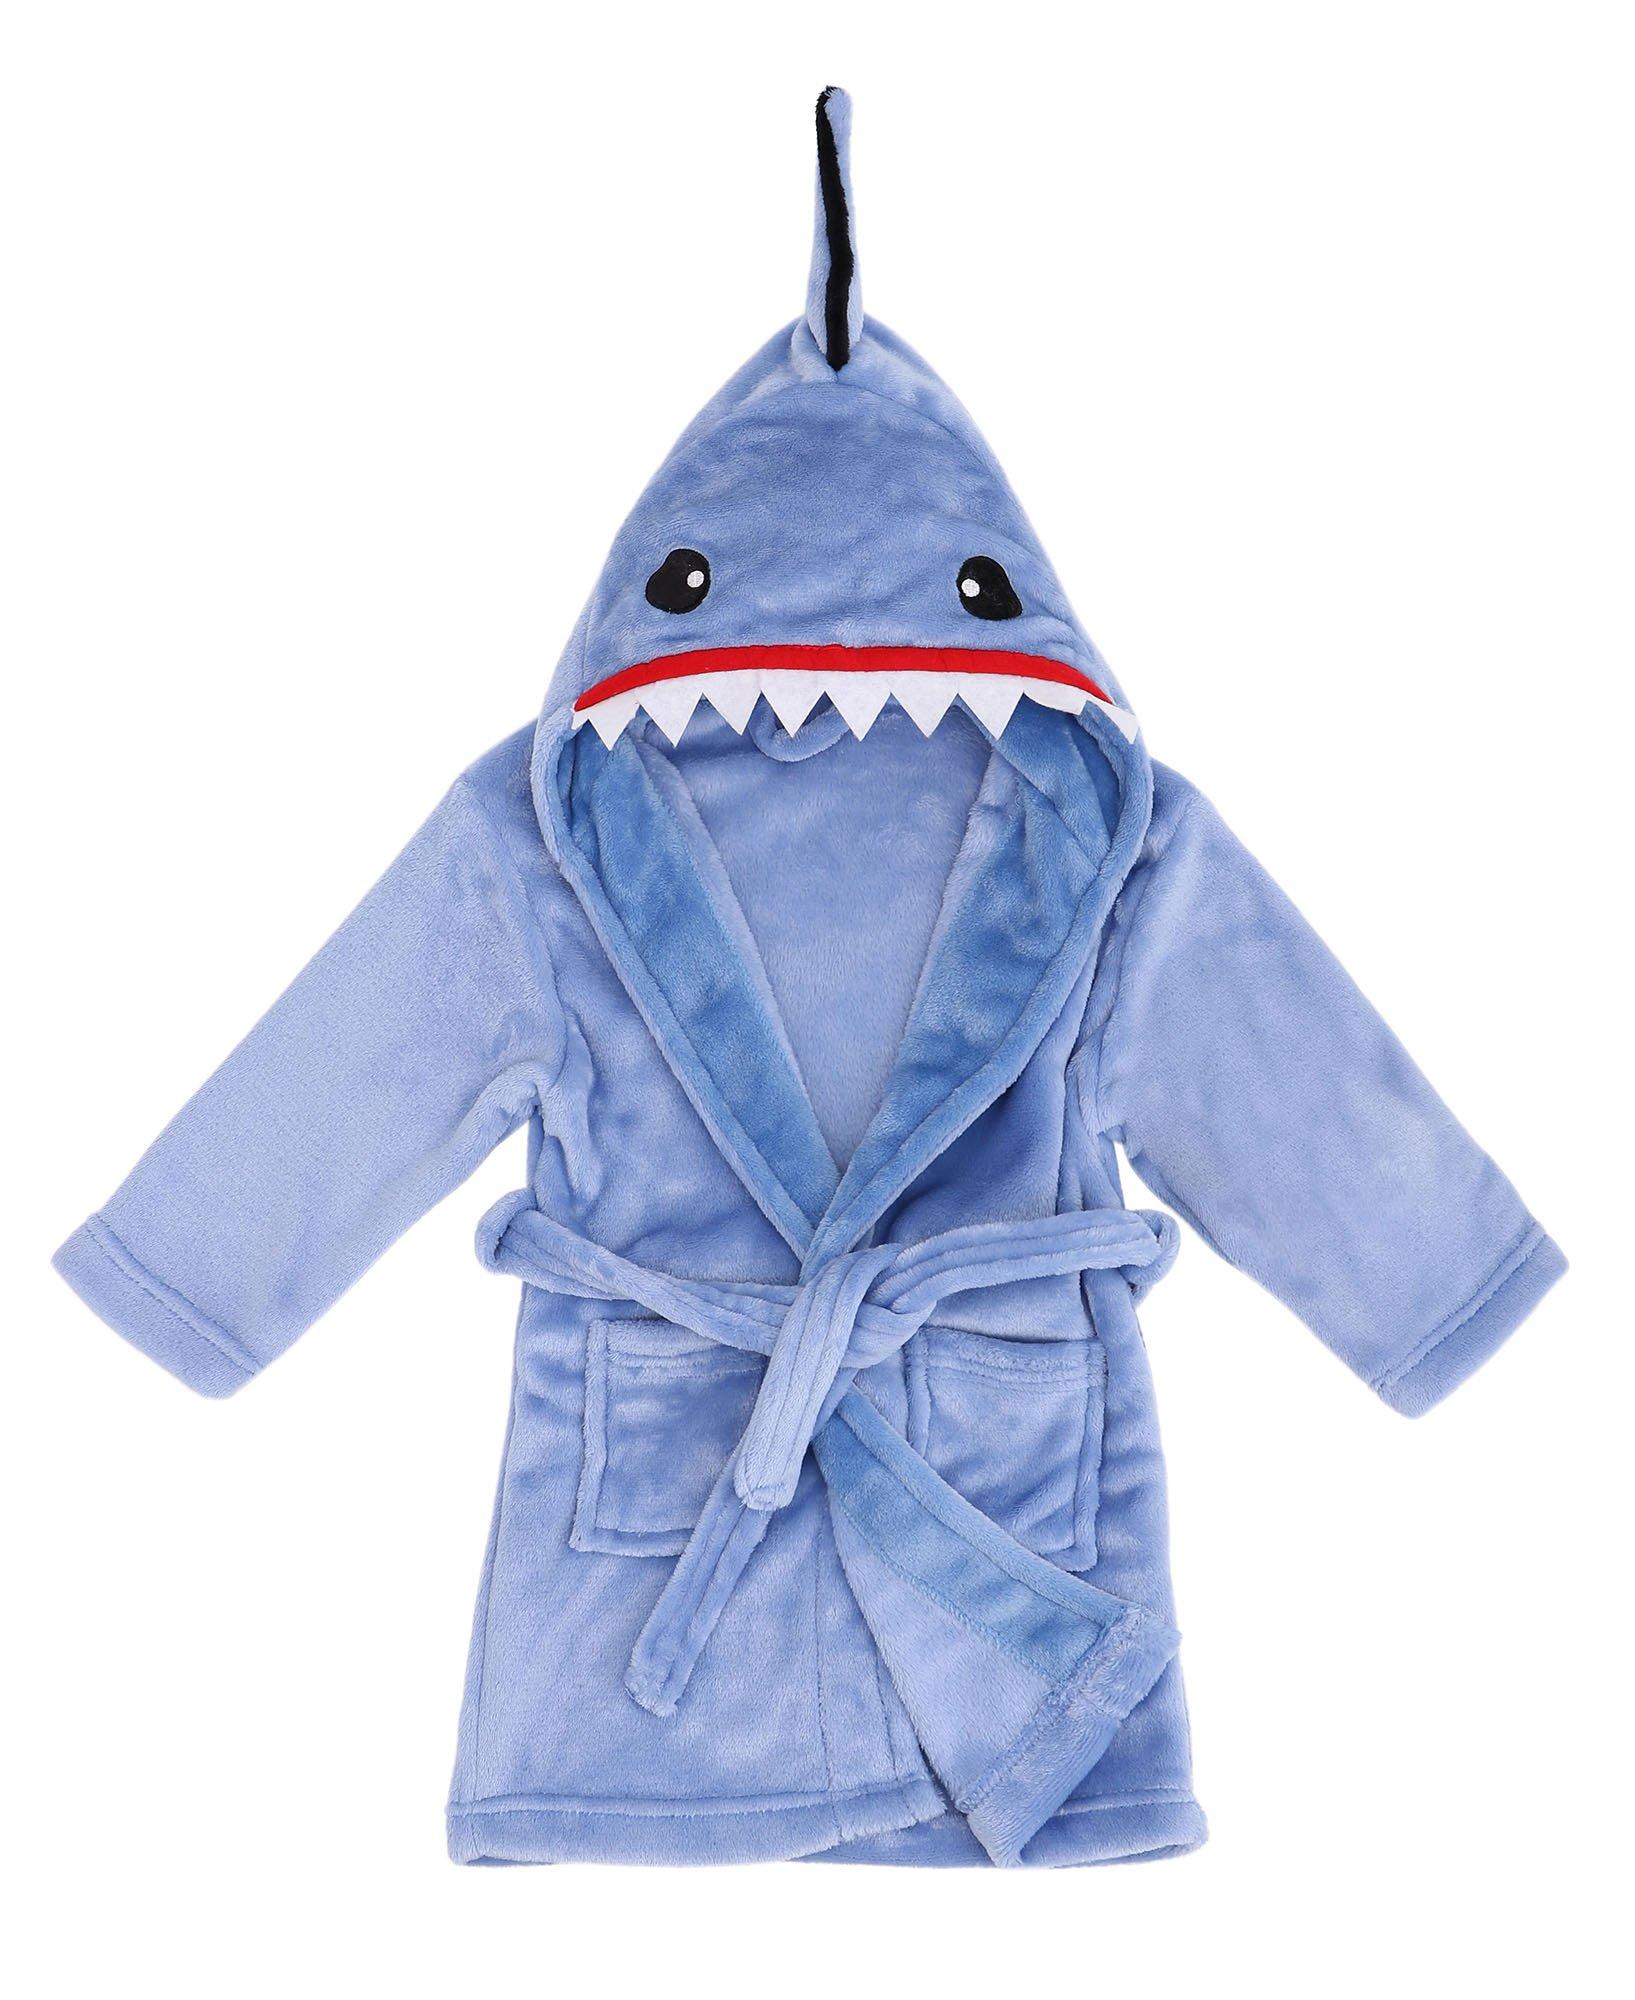 Animal Robe Soft Hooded Terry Cloth Bathrobe Sleepwear,Shark Blue,L(7-10 Years)